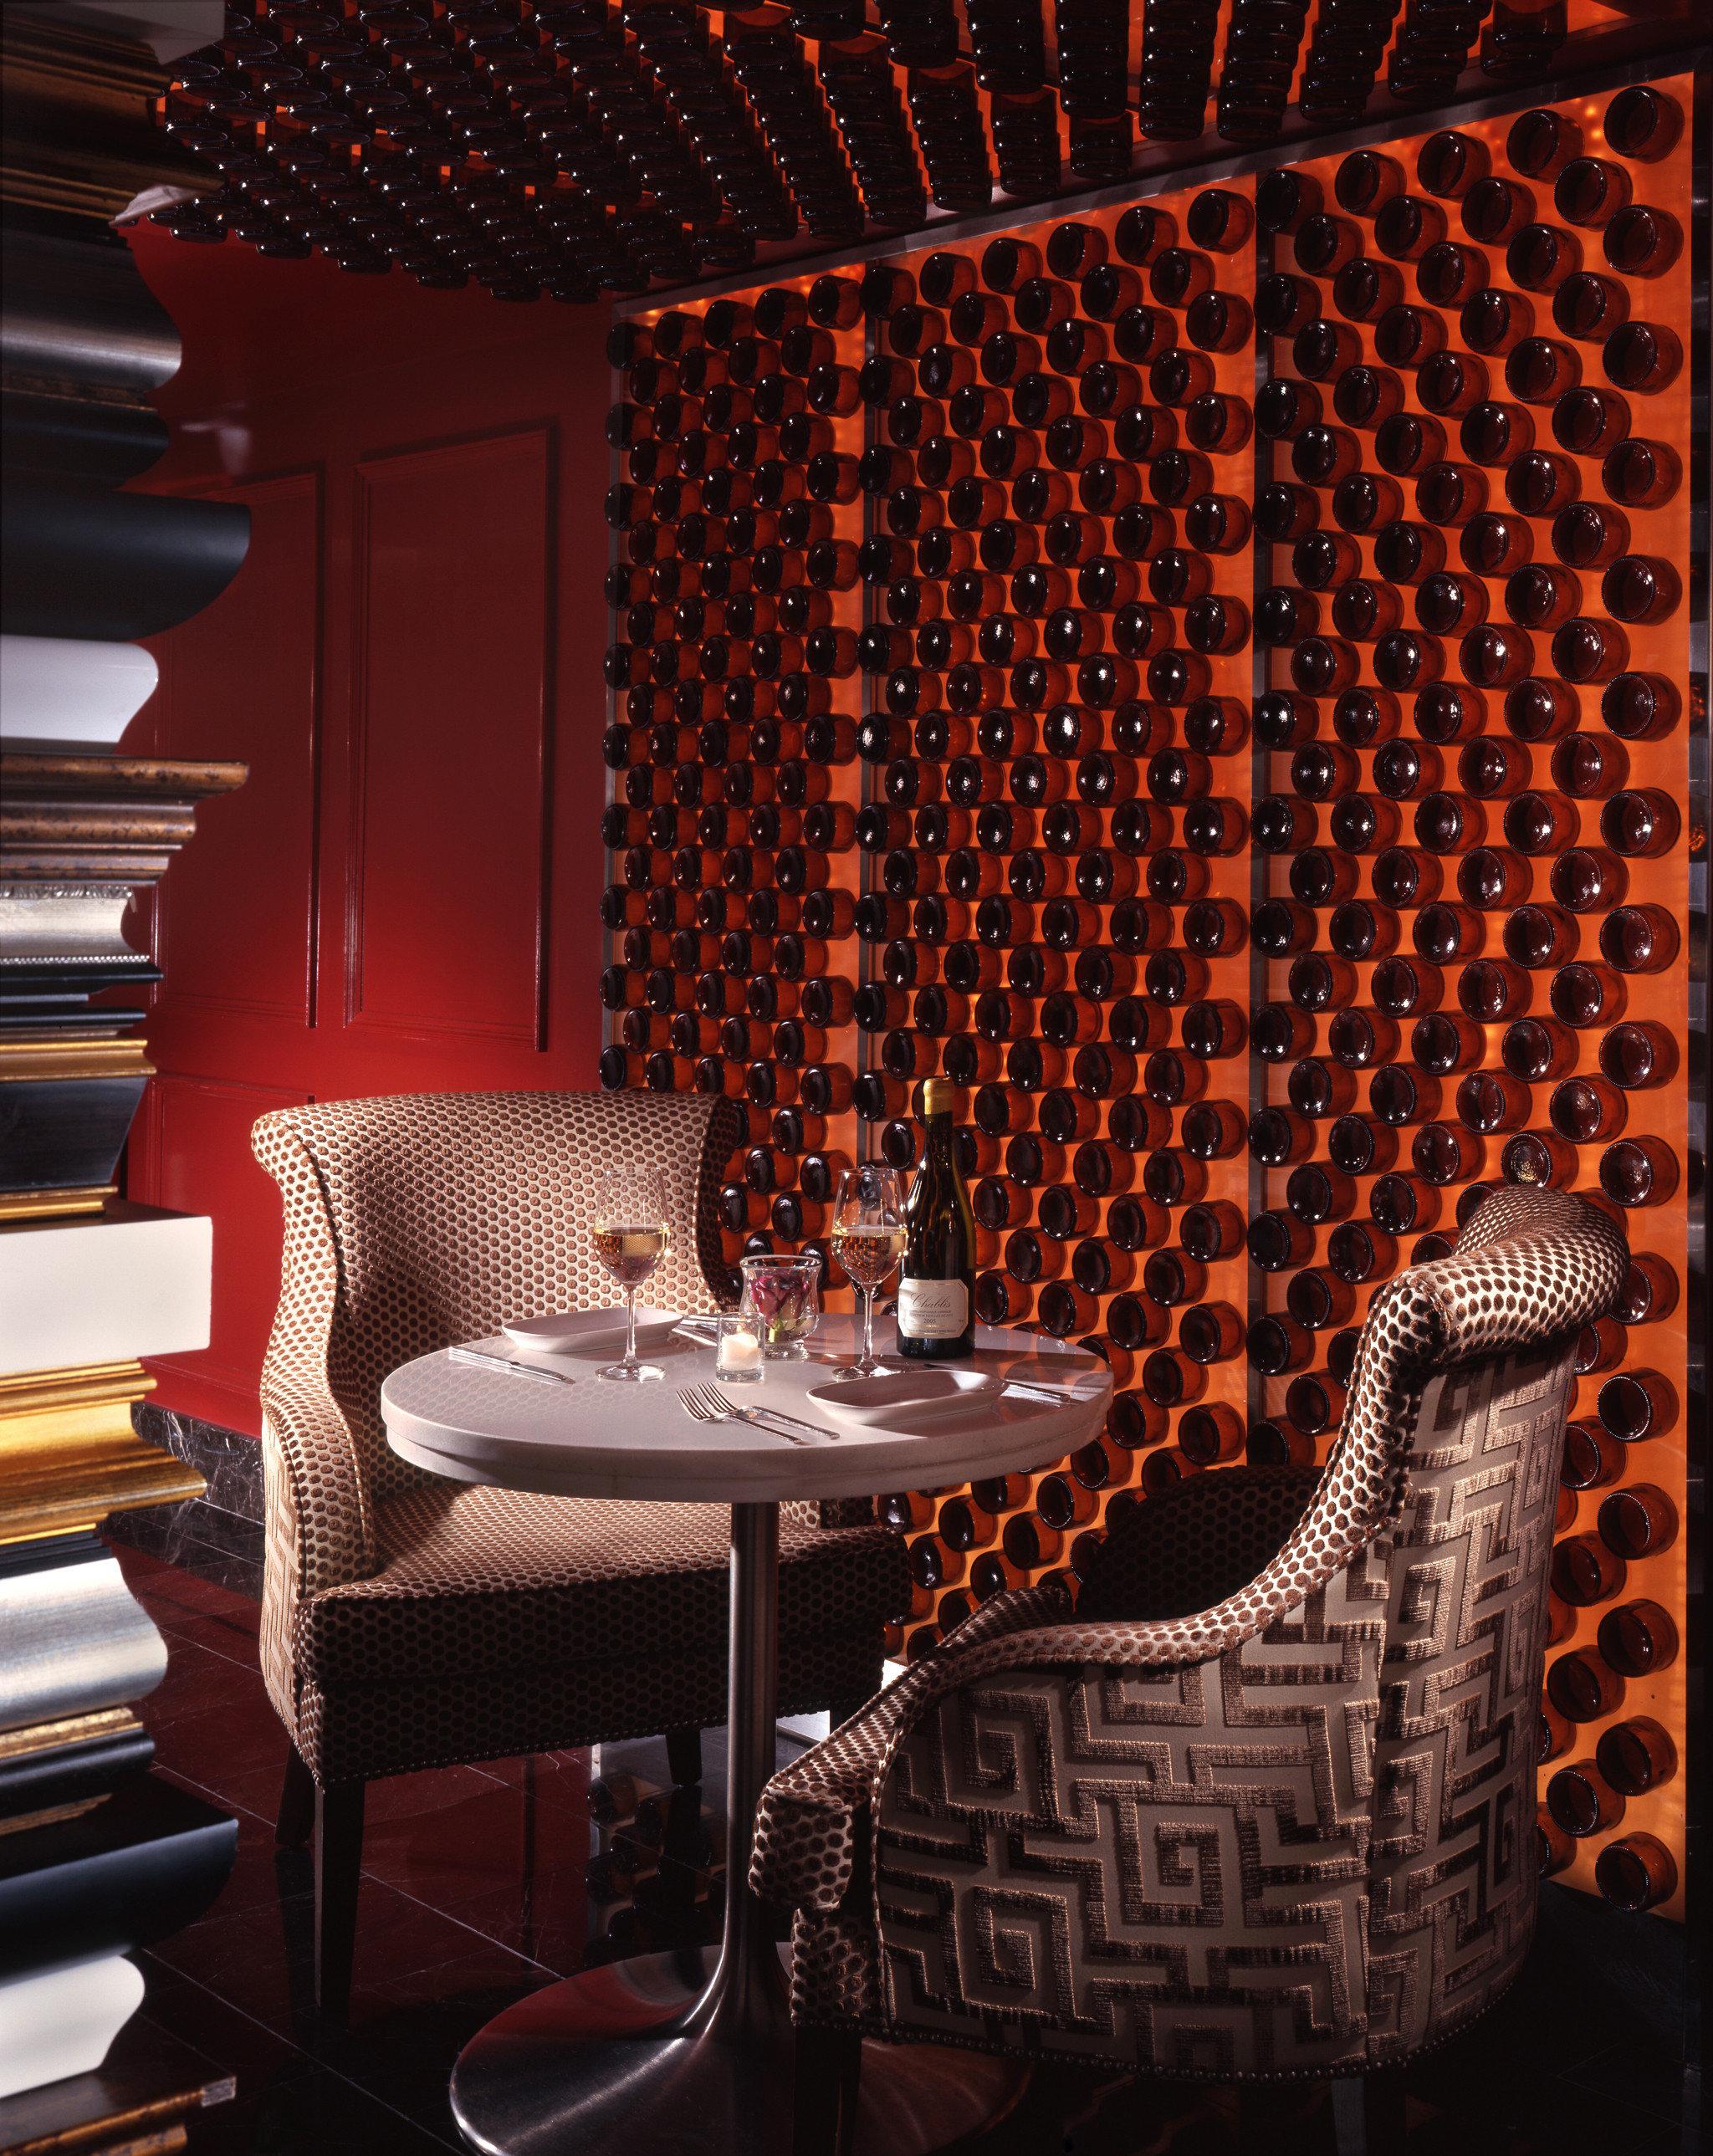 Bar Dining Drink Eat Luxury Modern chair lighting stage restaurant wallpaper